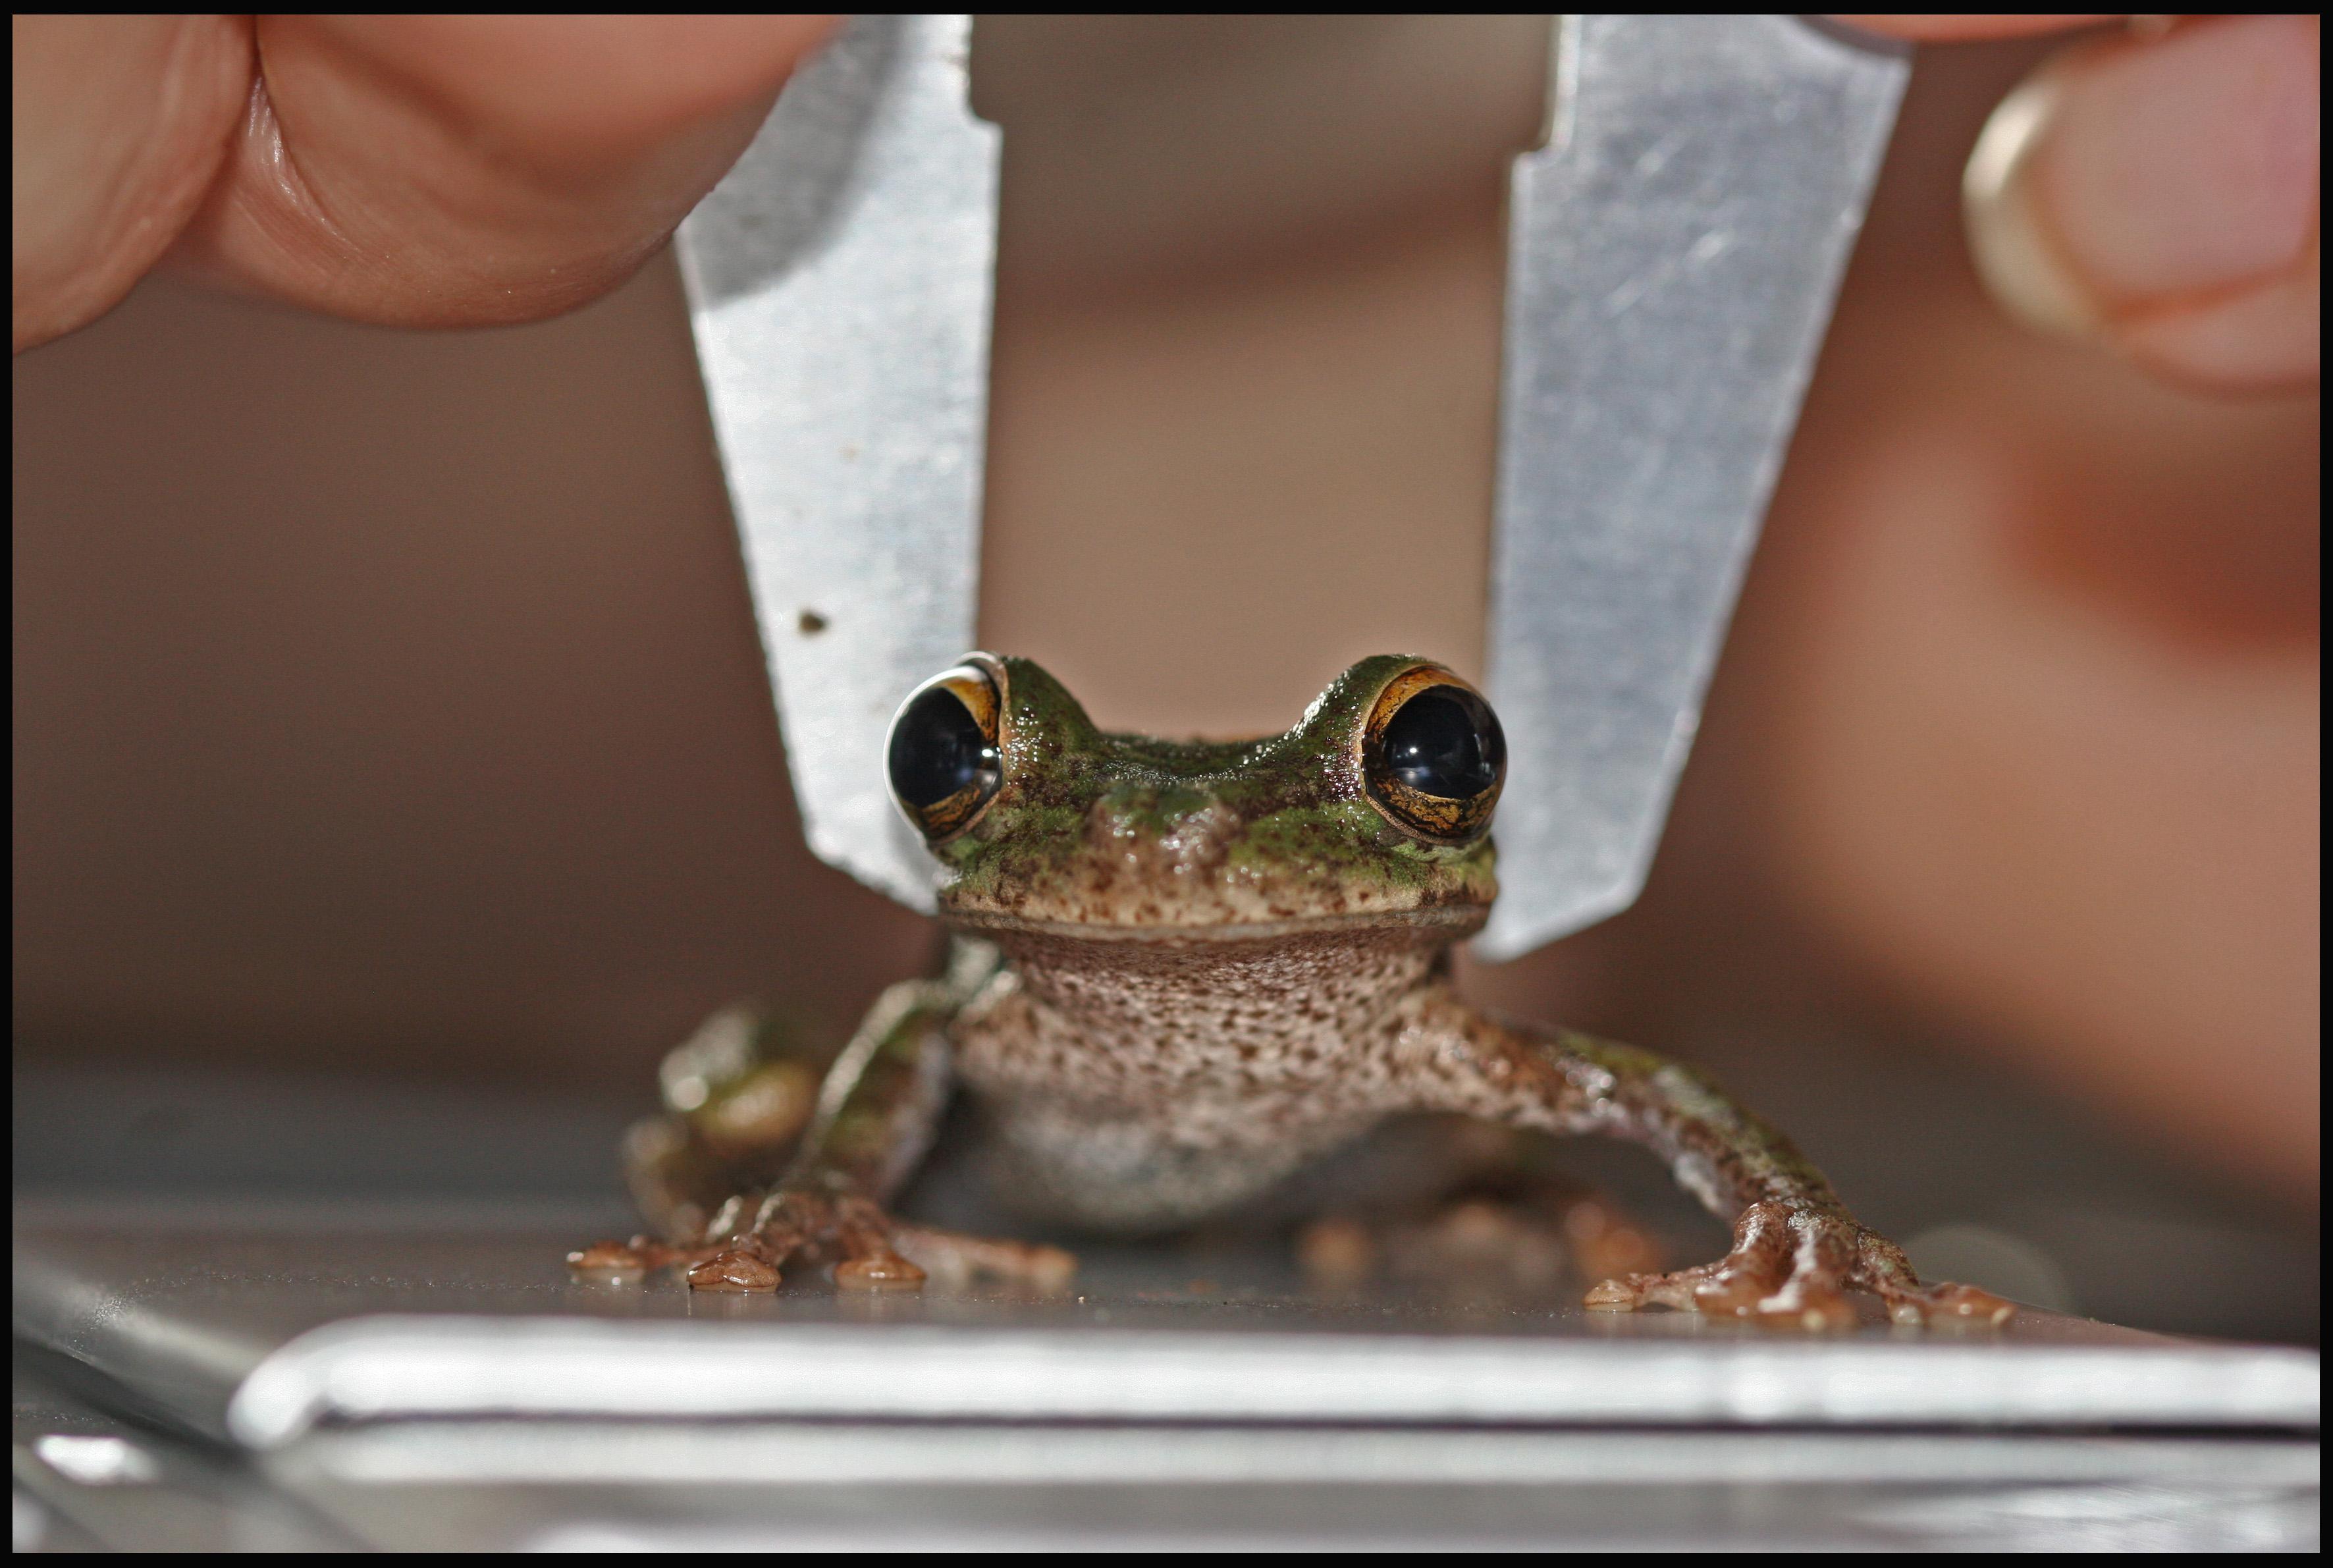 Frog biometrics